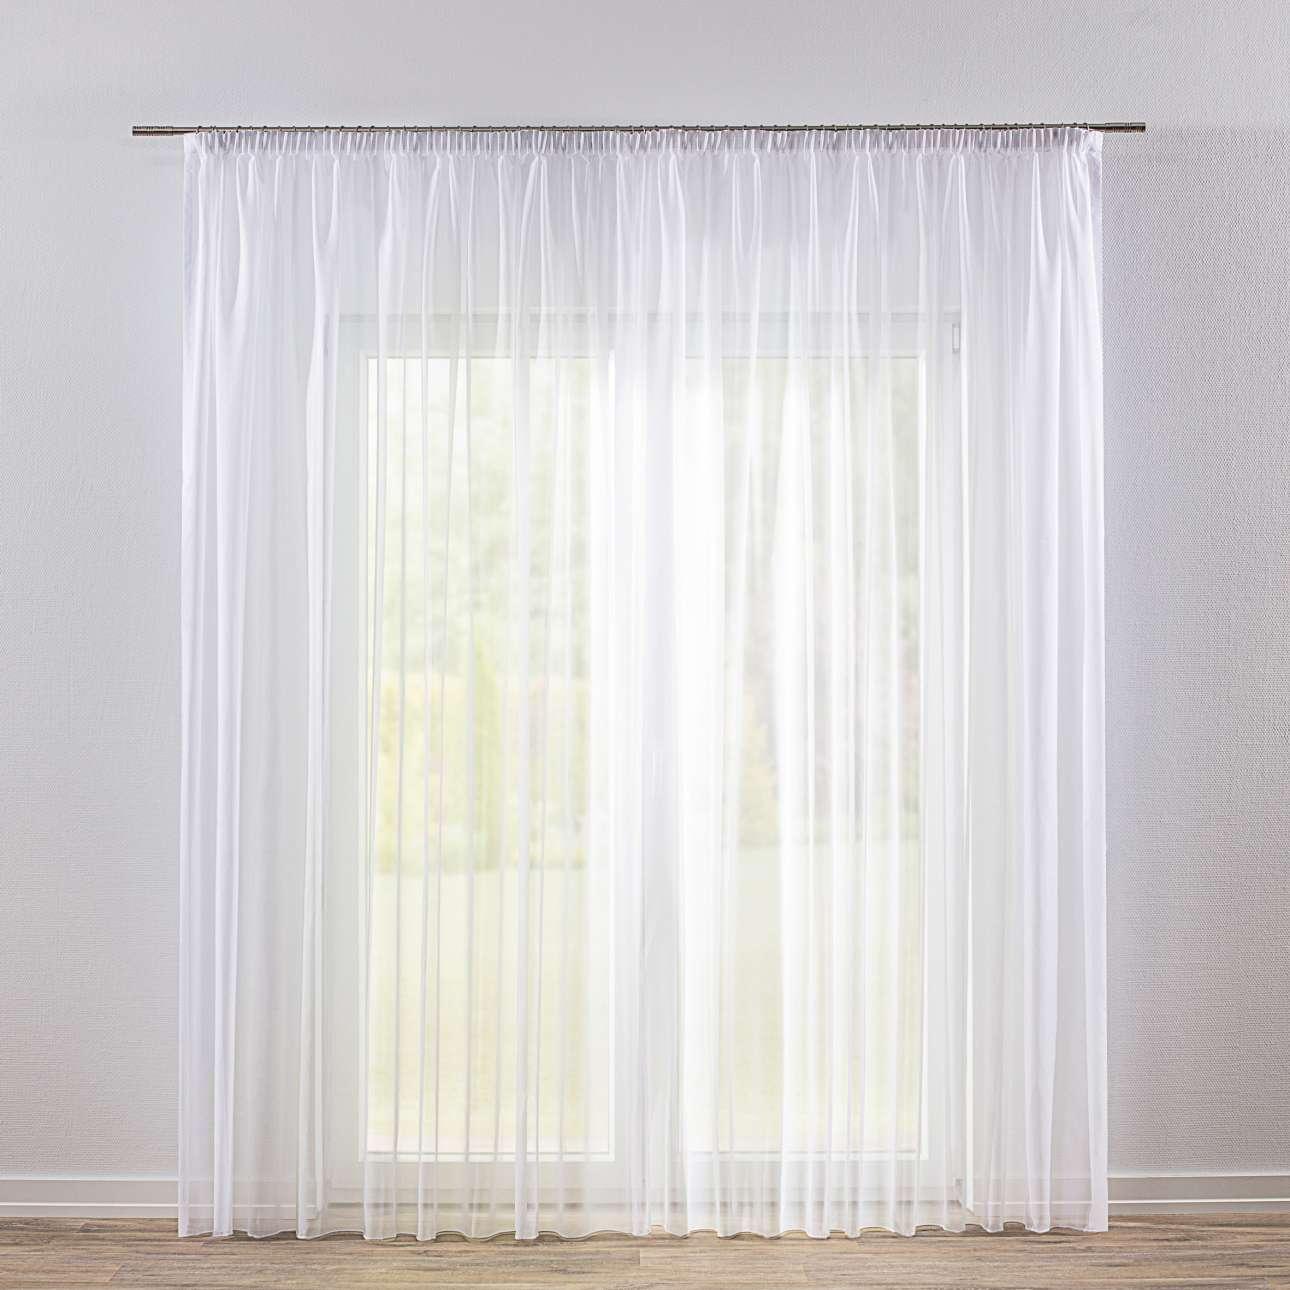 Dekoria Záclona voálová jednoduchá s řasící páskou na míru, bílá s našitým olůvkem, 300x260 cm, Voile - Voál, 901-00